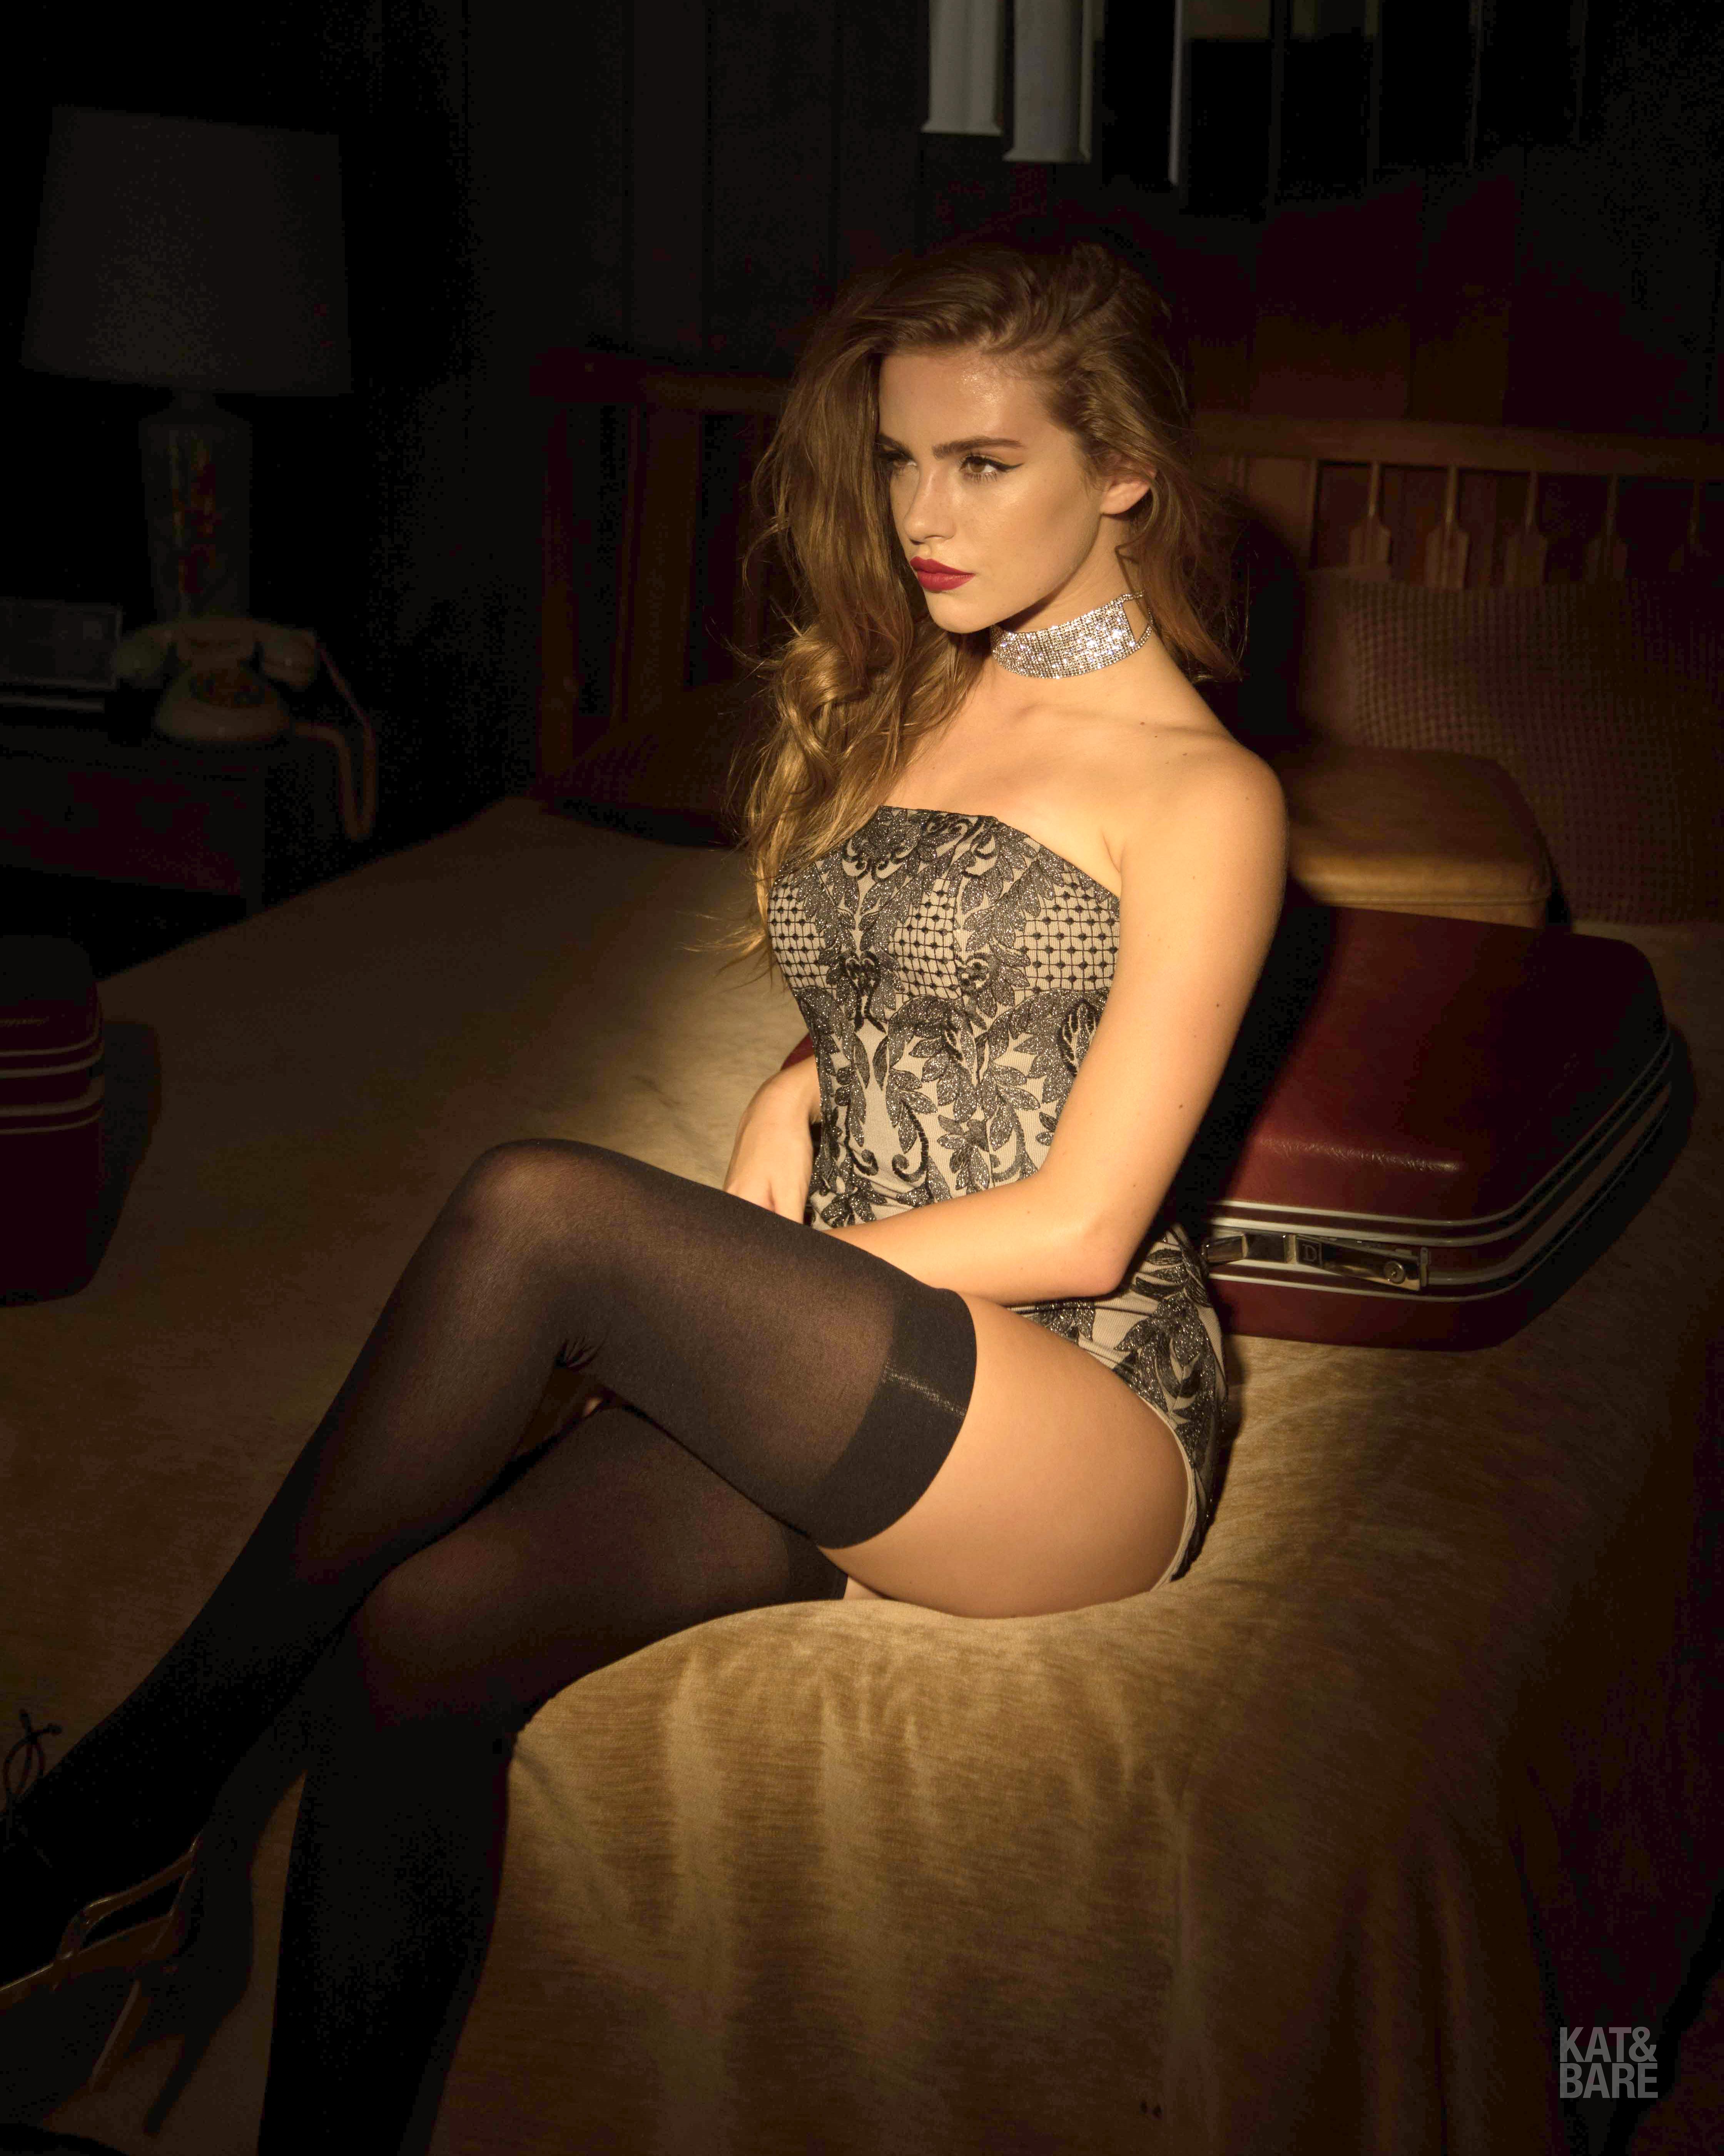 Kat_Motelroom_4_Bridgett